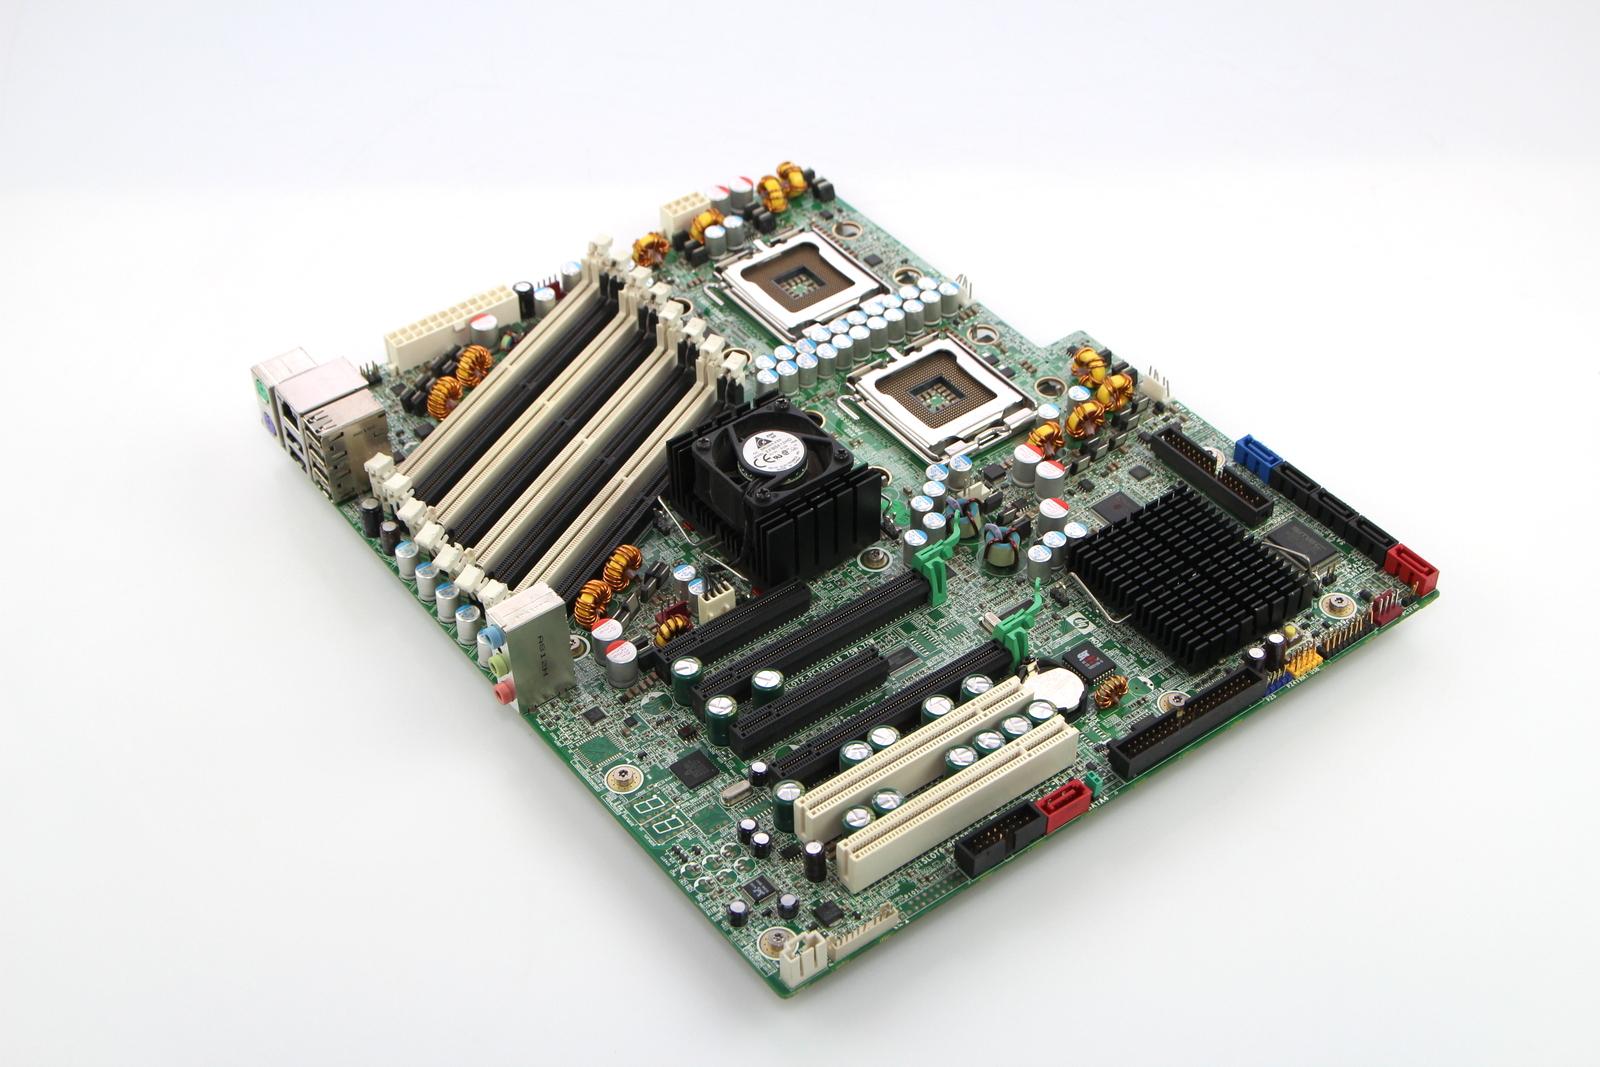 HP XW6600 NETWORK WINDOWS 7 X64 DRIVER